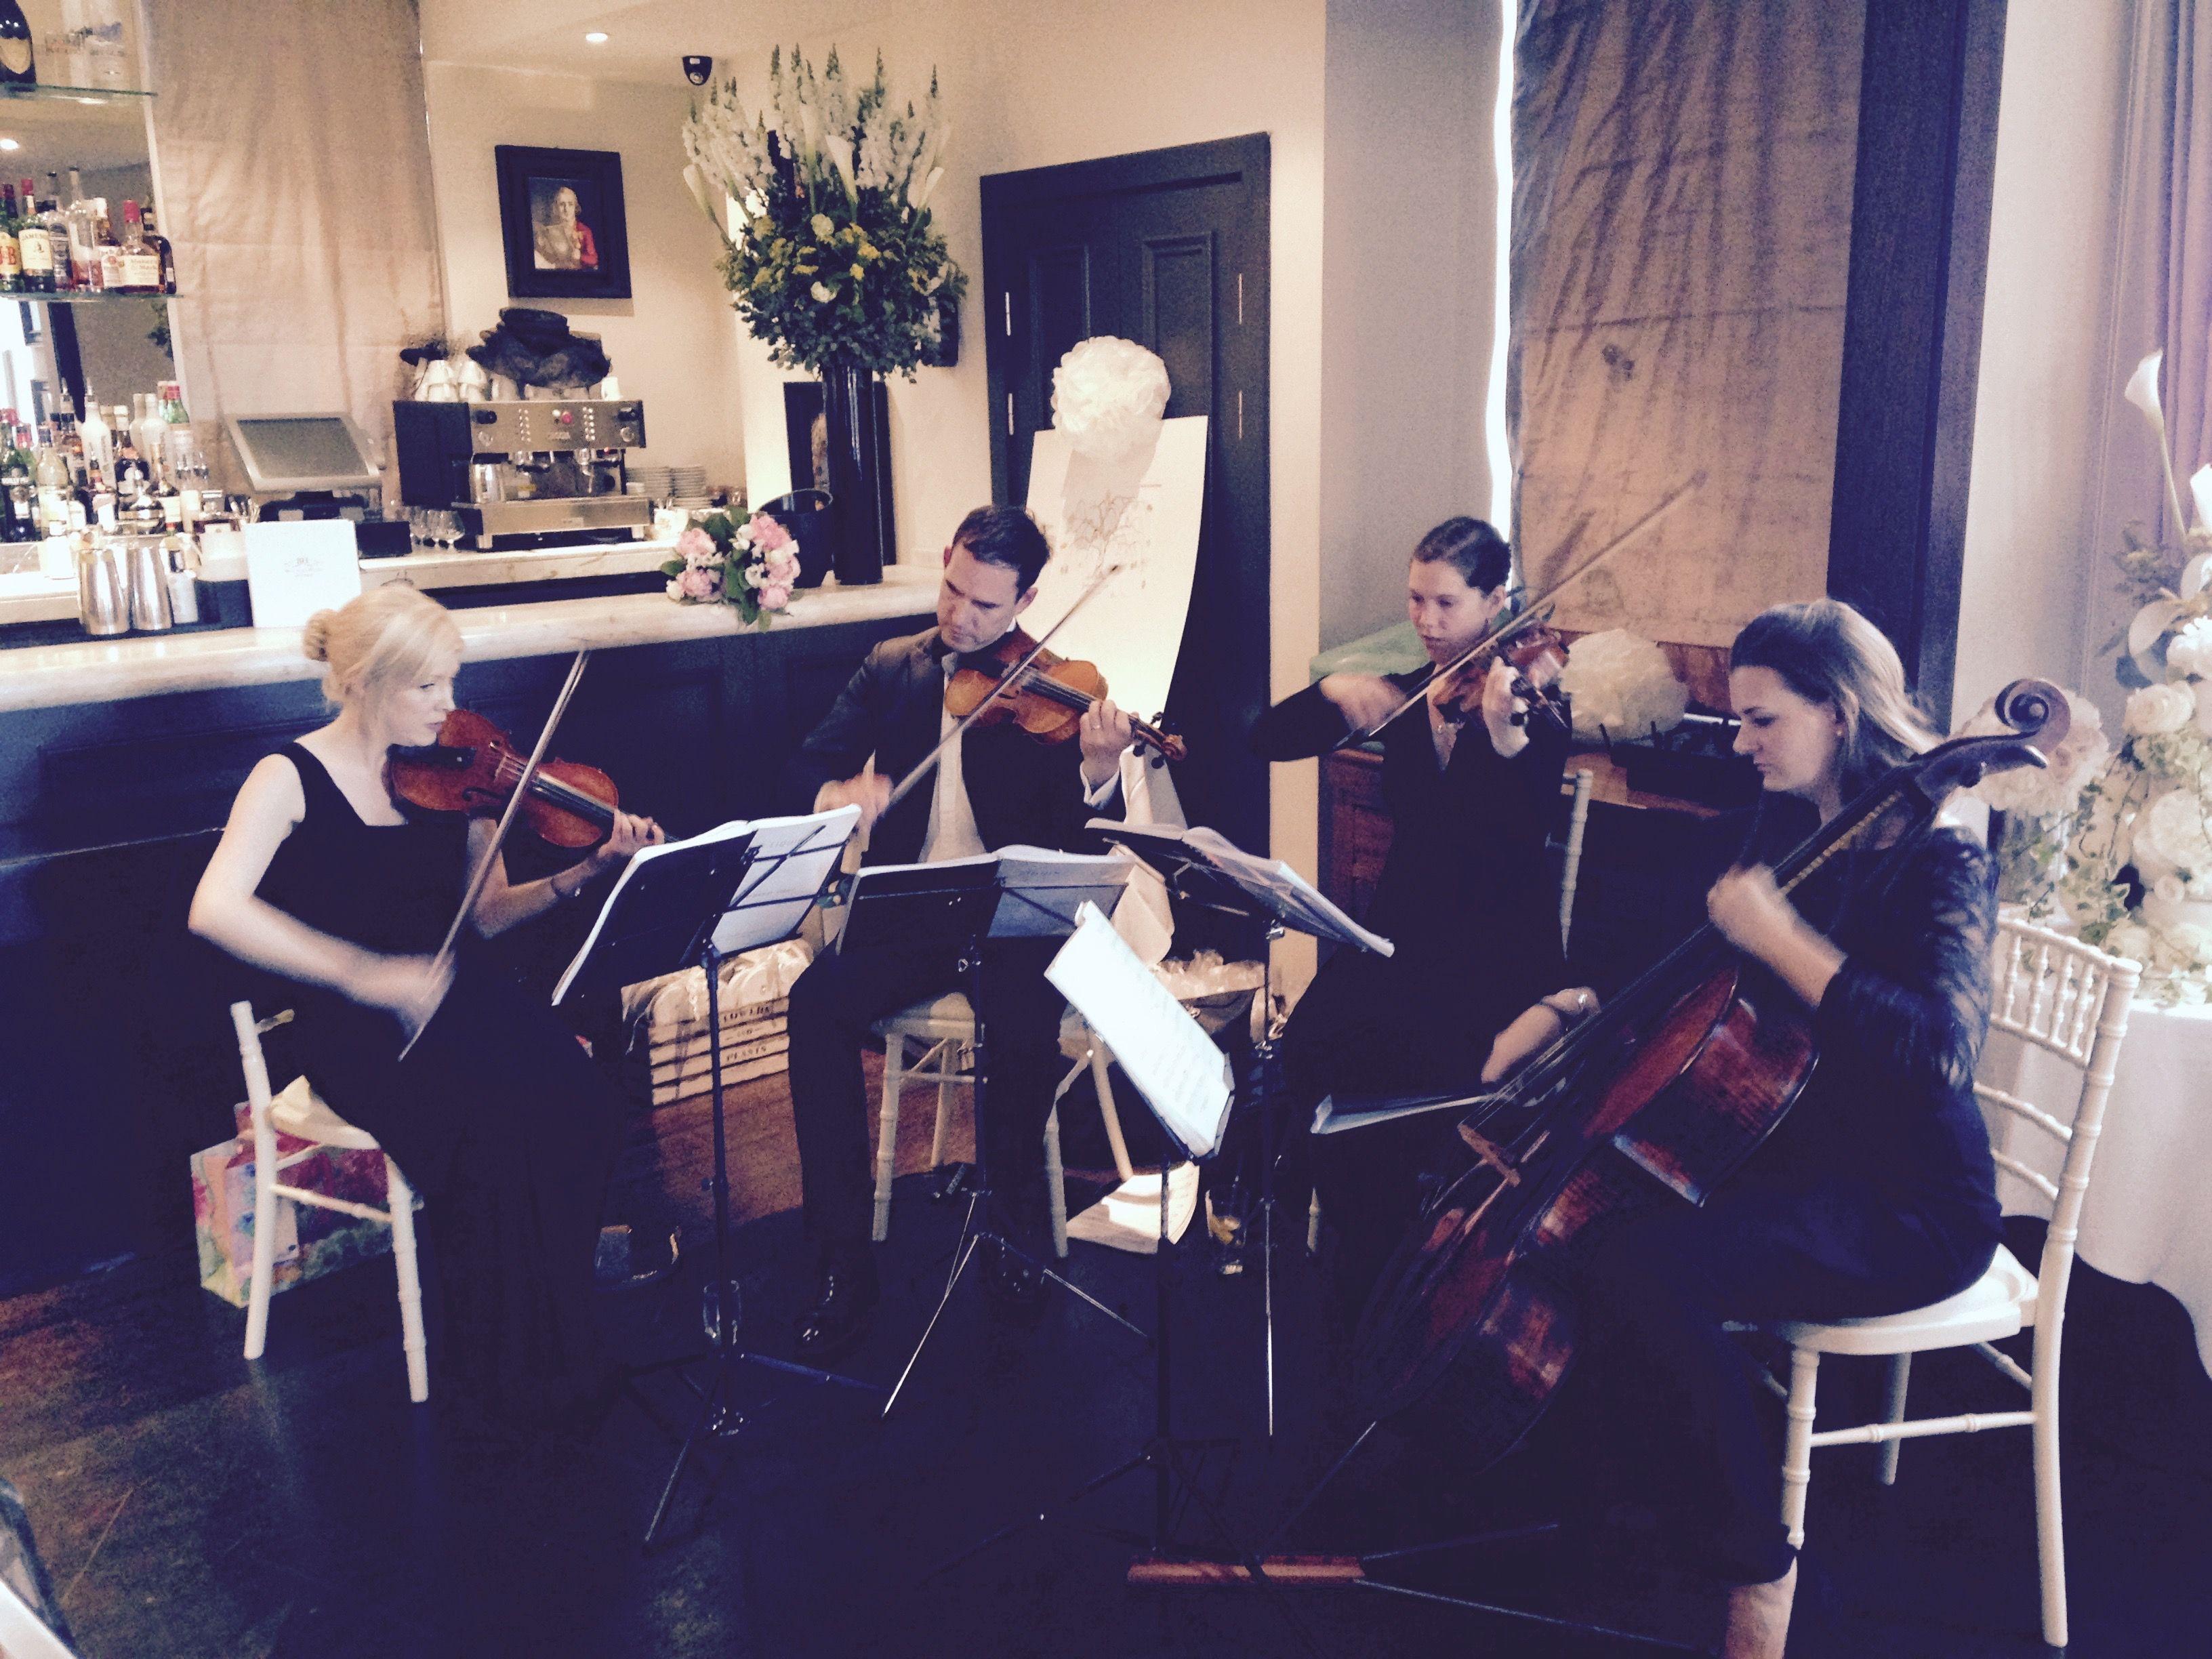 String Quartet Wedding.String Quartet Entertaining The Guests At A Wedding In Beaufort